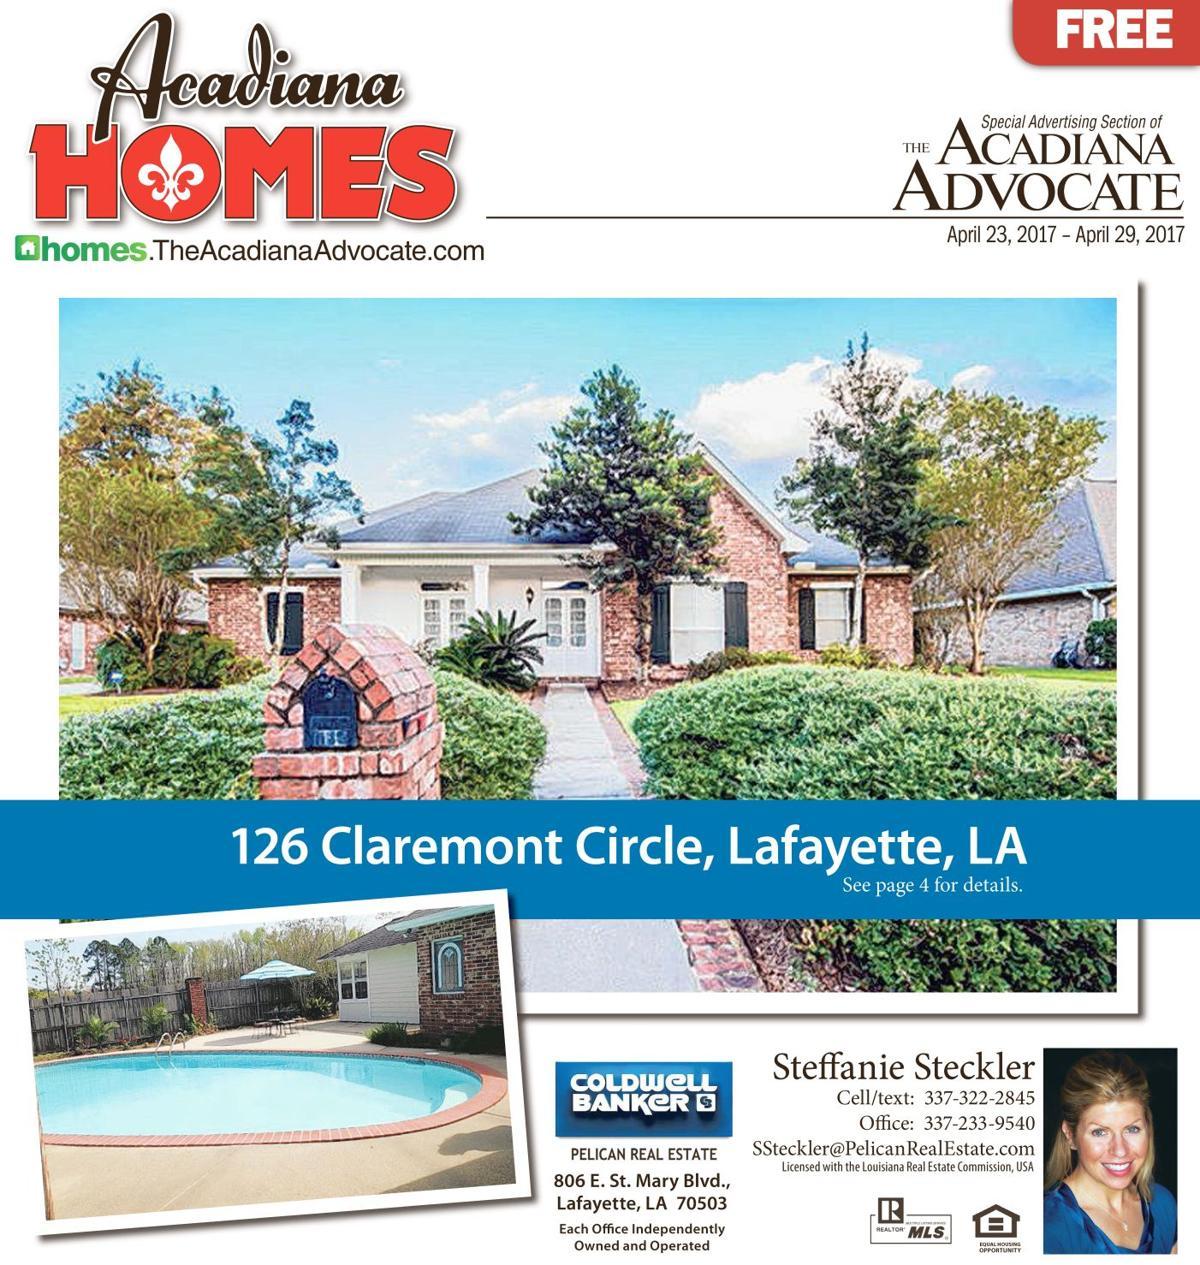 126 Claremont Circle, Lafayette, LA - Cover Acadiana Homes